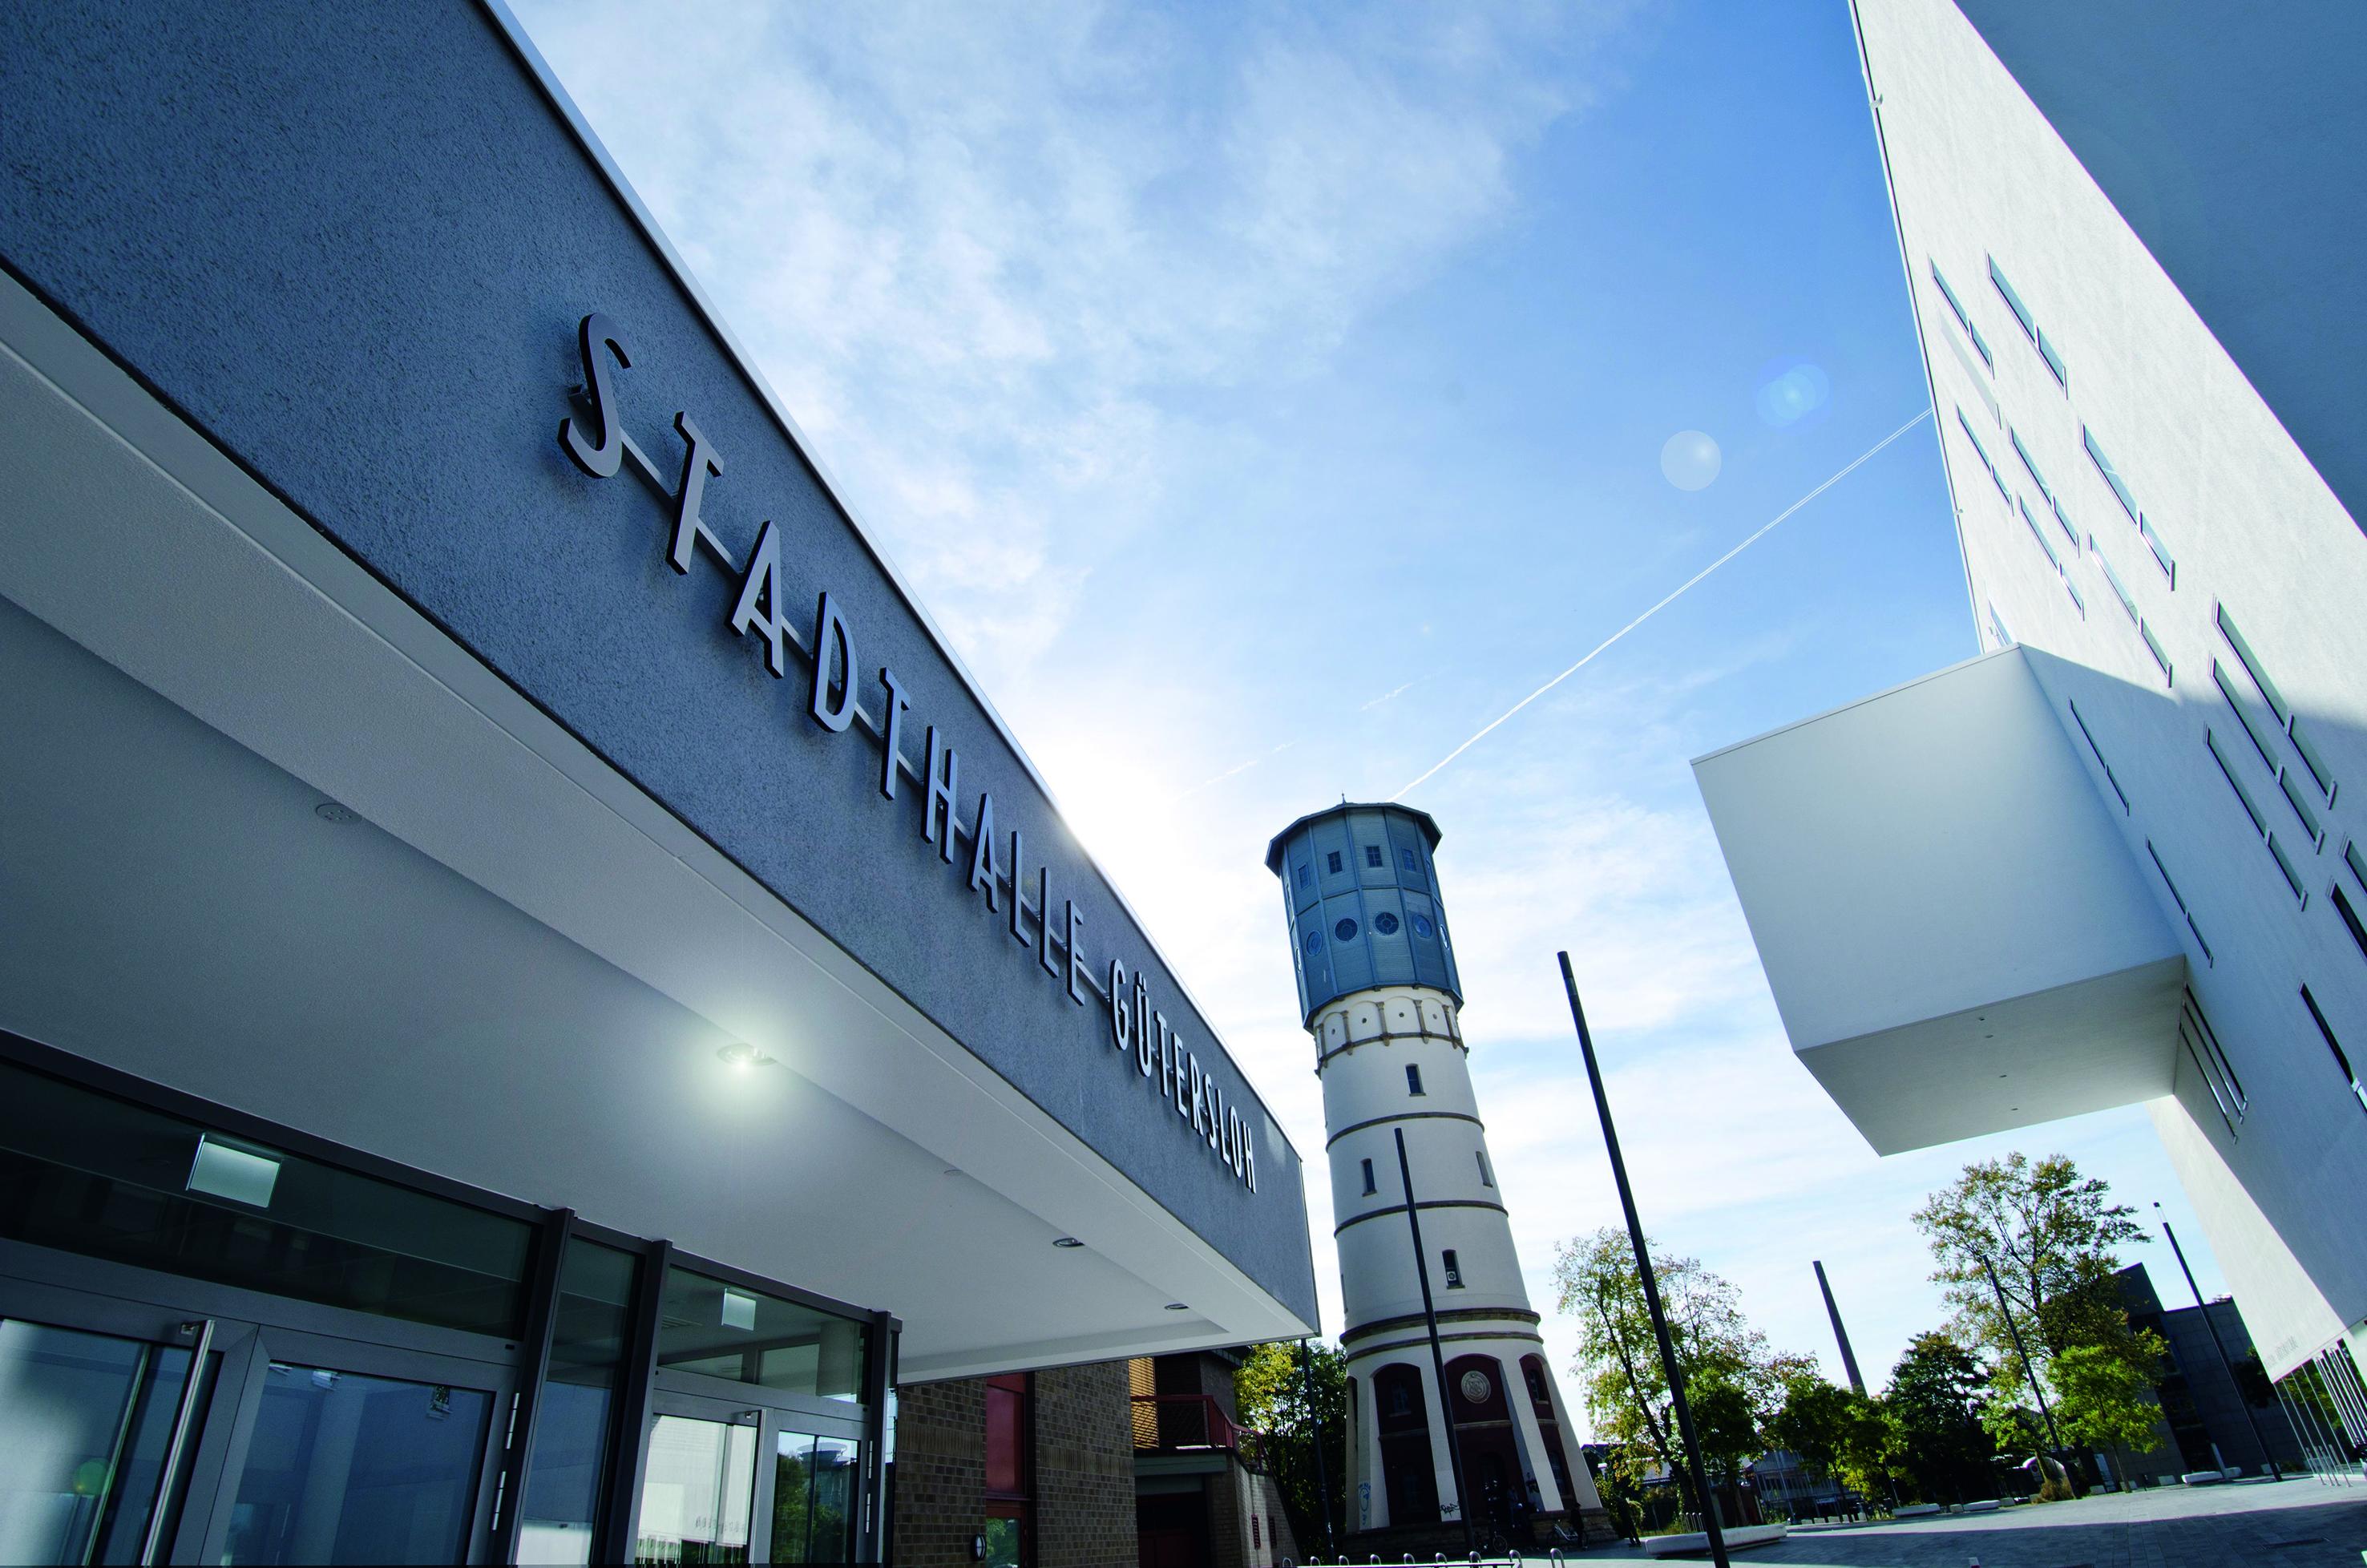 Stadthalle Gütersloh-Stadthalle Gütersloh